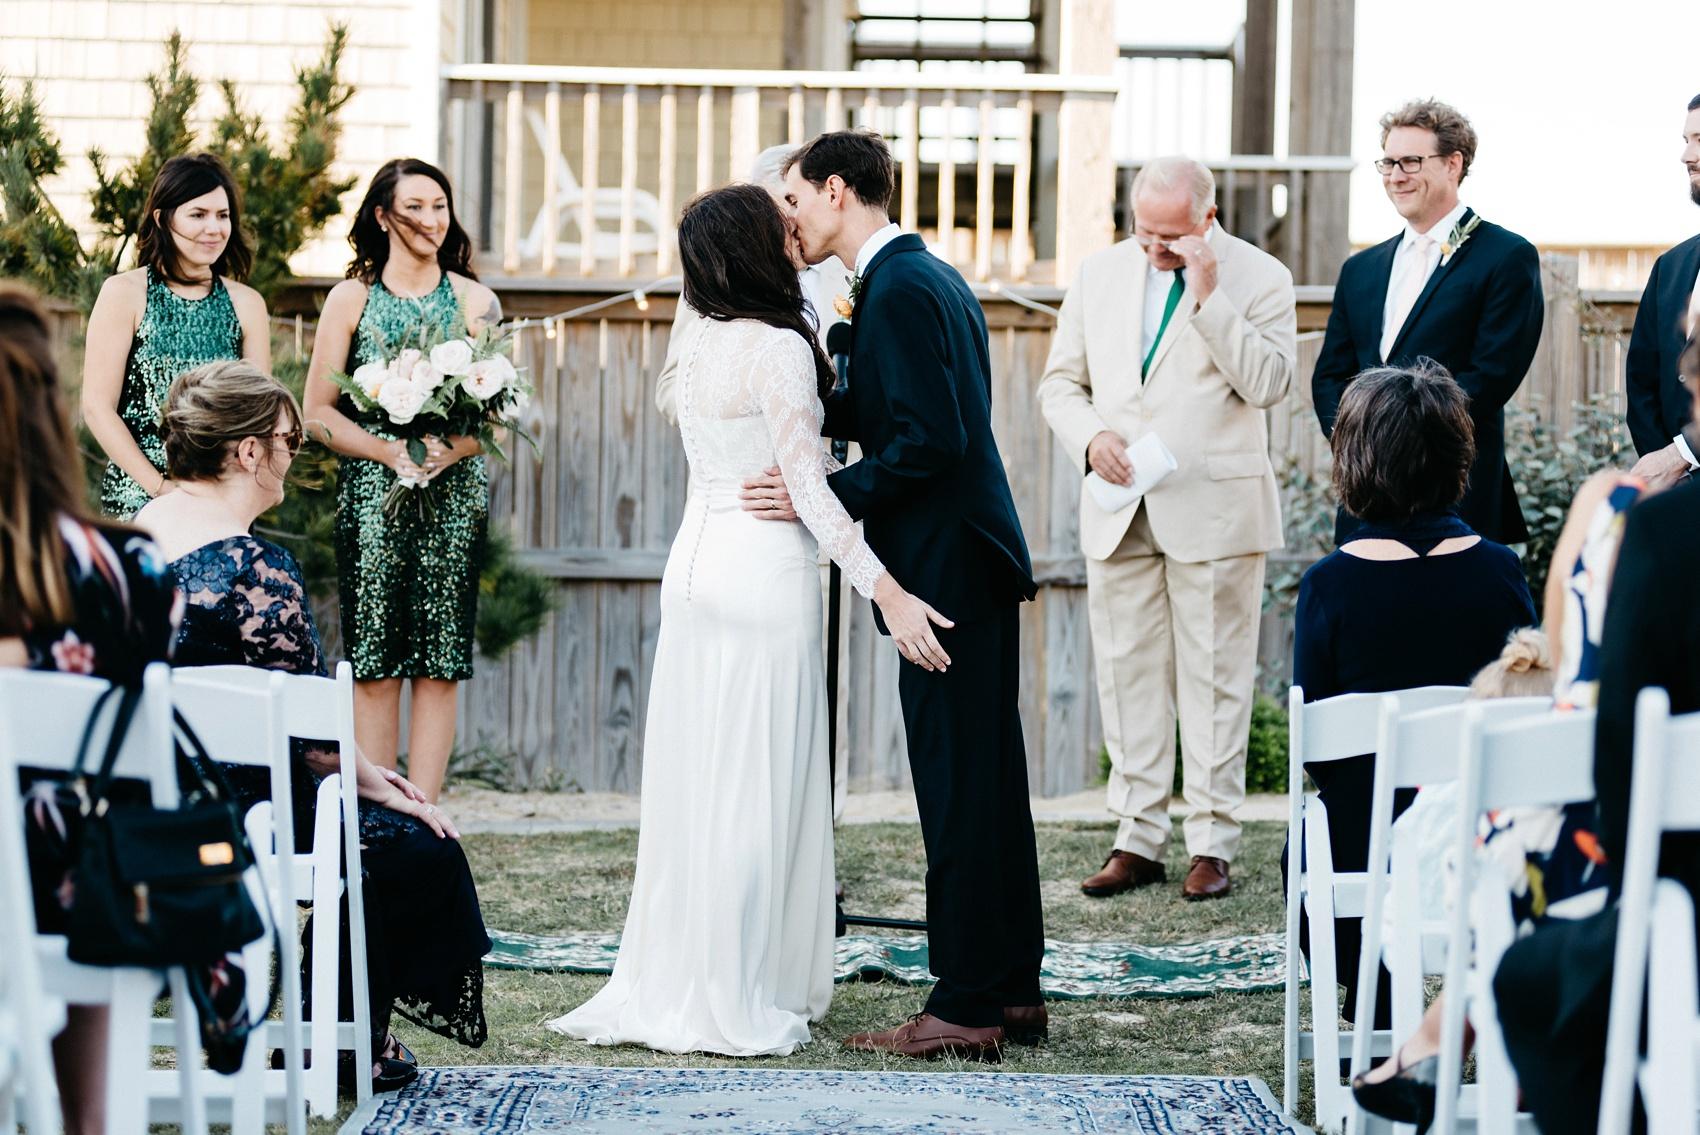 outerbanks_wedding_photographer_1286.jpg